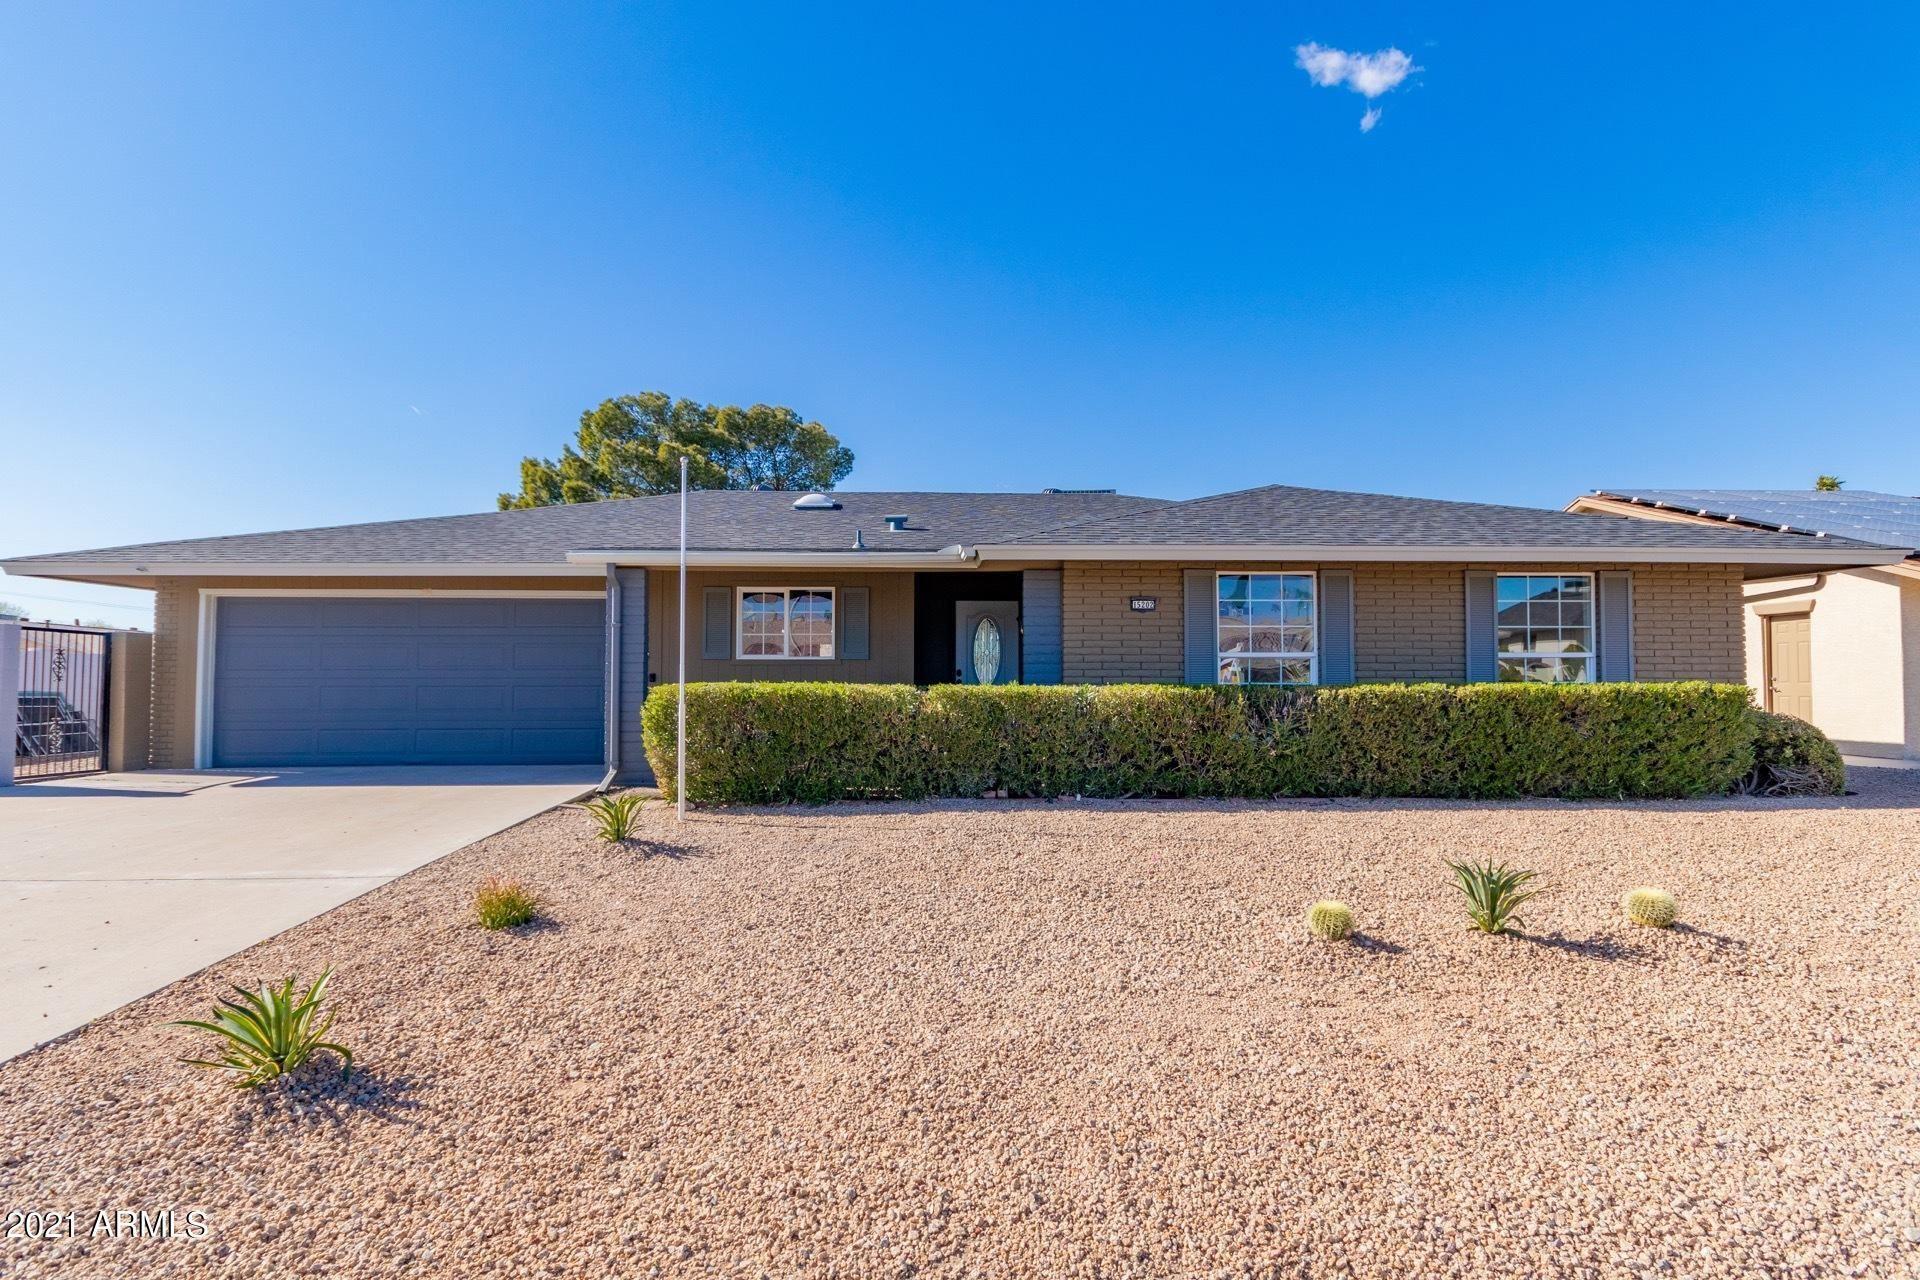 Photo of 15202 N AGUA FRIA Drive, Sun City, AZ 85351 (MLS # 6199187)